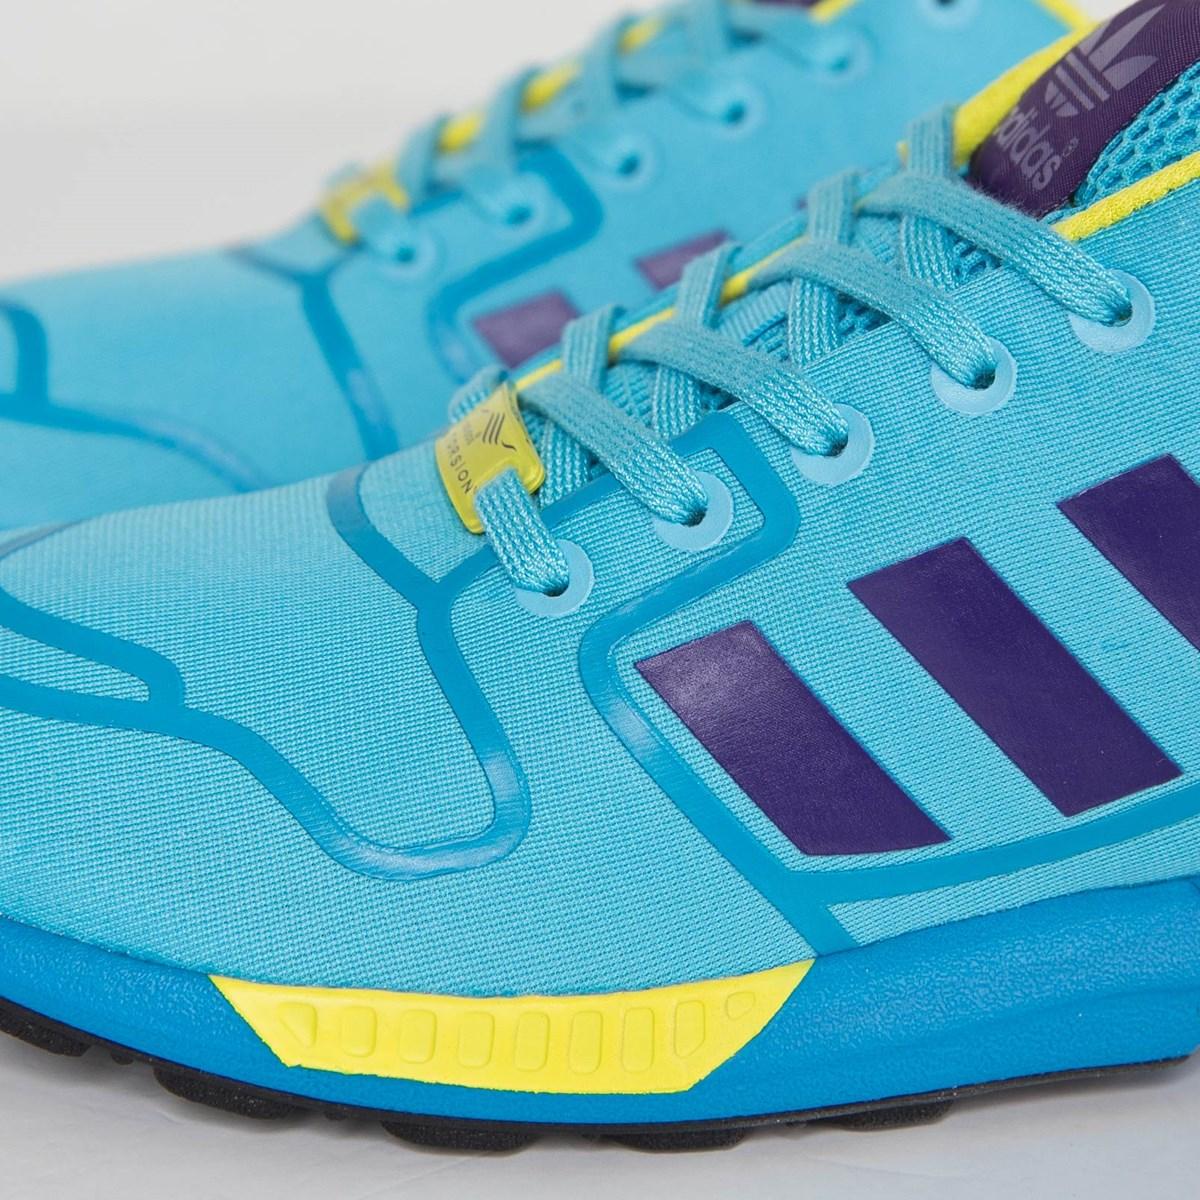 3816c5bfb adidas ZX Flux - Af6303 - Sneakersnstuff